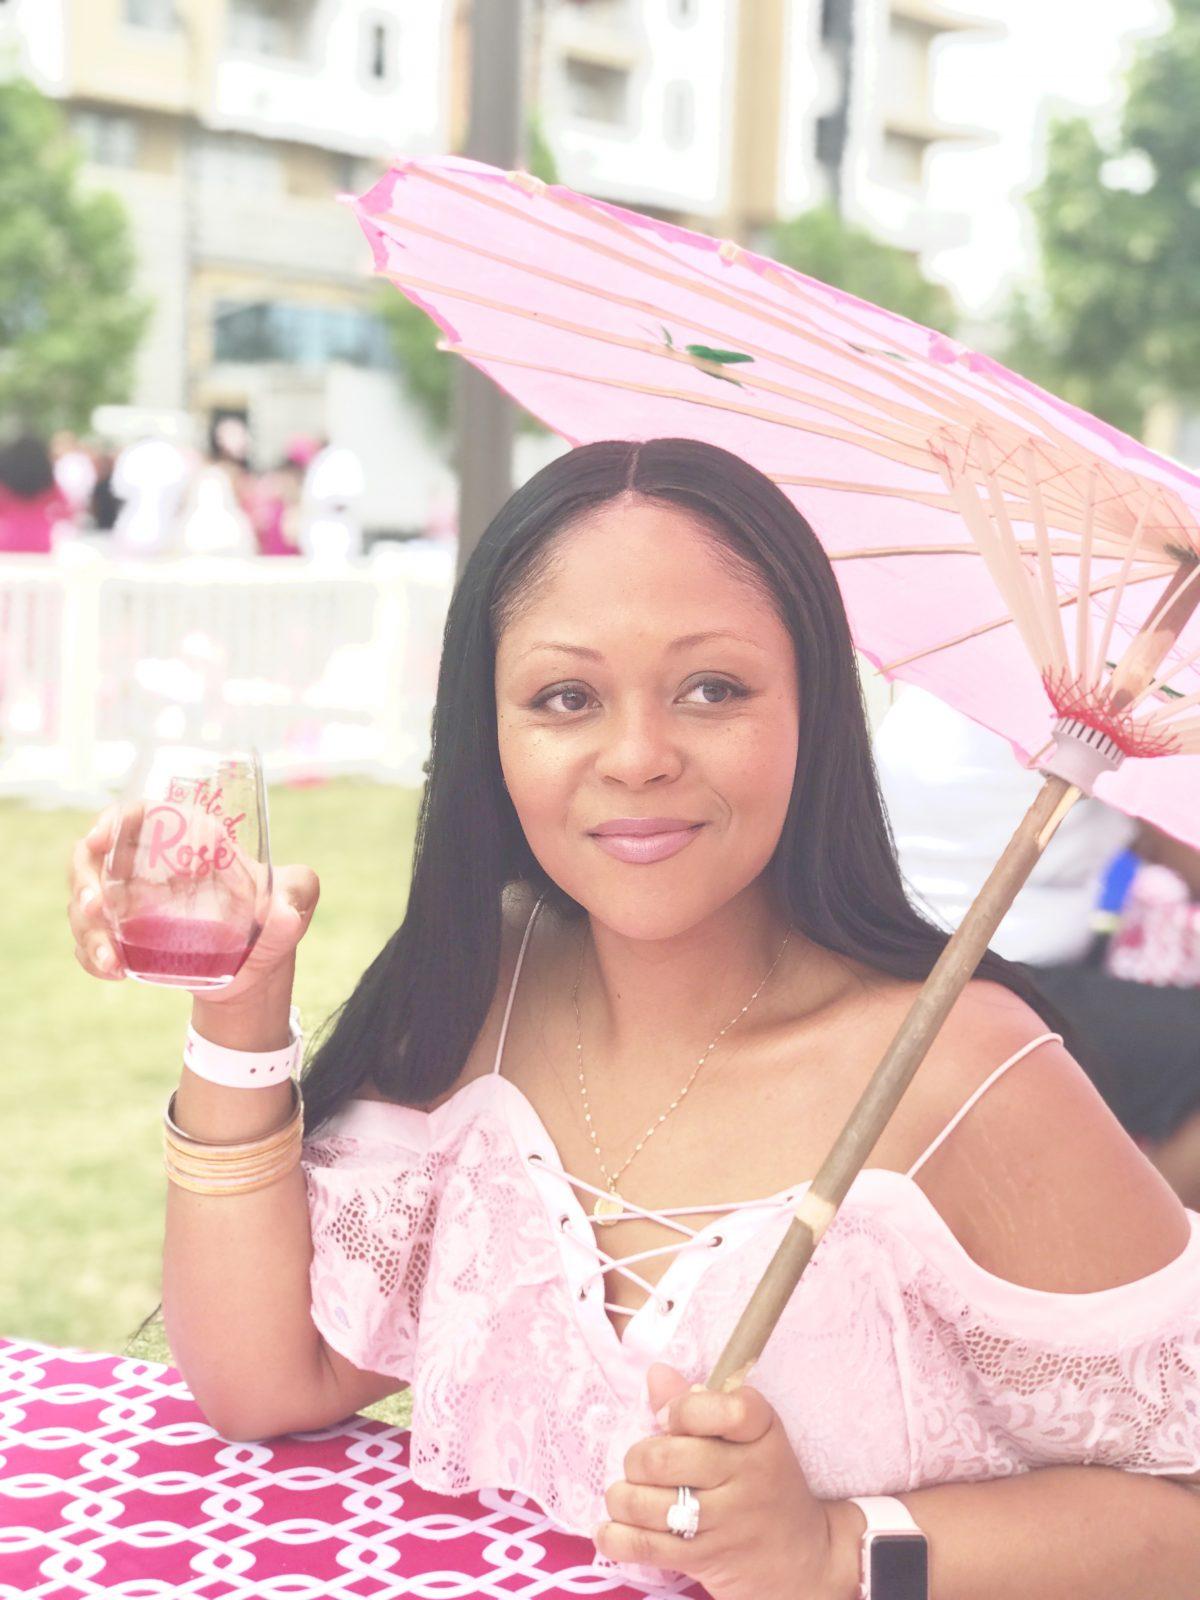 Atlanta's Inaugural La Fête du Rosé. Full Recap